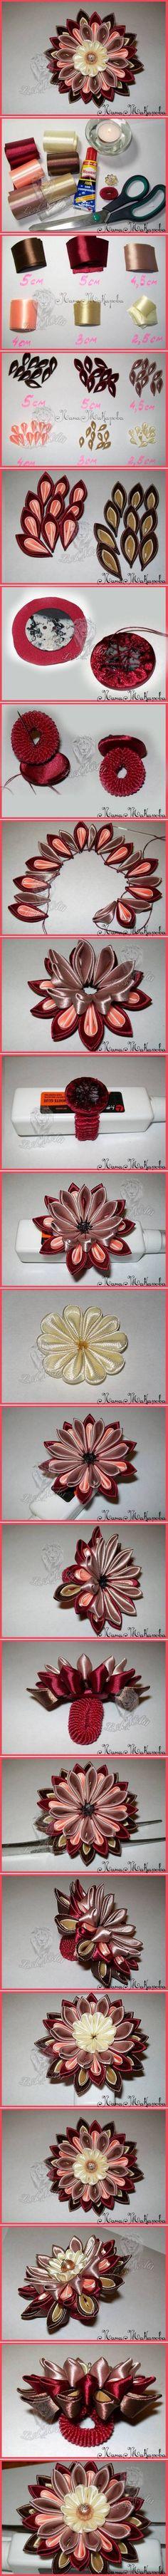 DIY Beautiful Kanzashi Ribbon Flower | www.FabArtDIY.com LIKE Us on Facebook == https://www.facebook.com/FabArtDIY